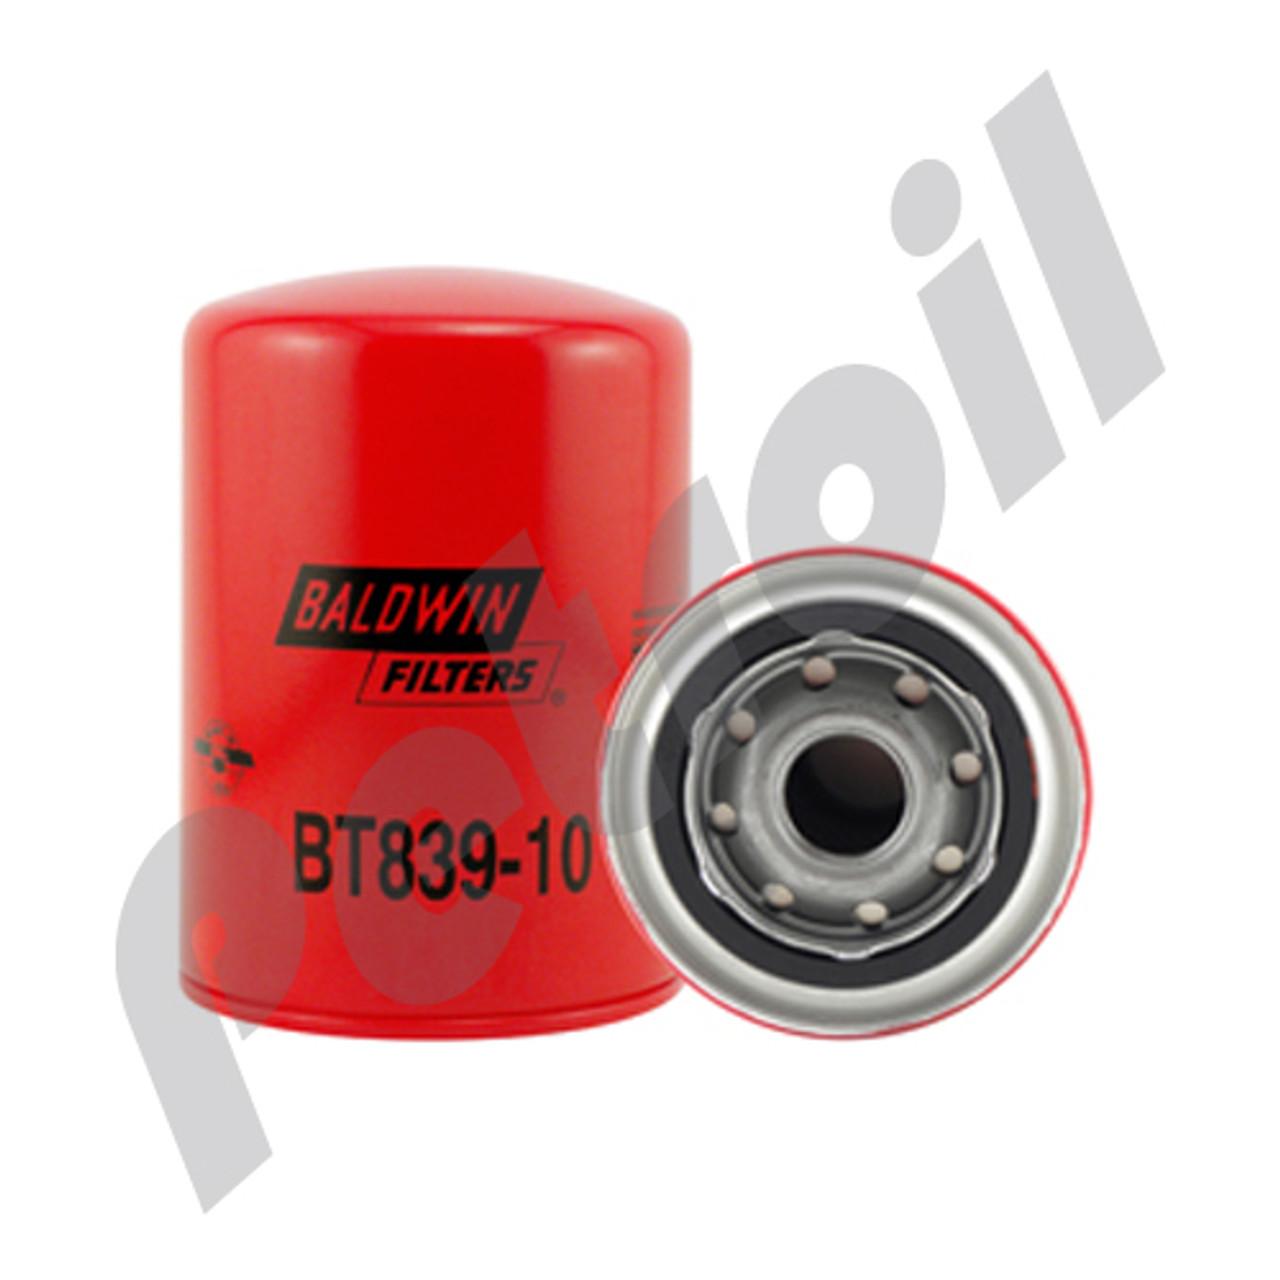 (Case of 12) BT839-10 Baldwin HEAVY DUTY HYDRAULIC SPIN-ON